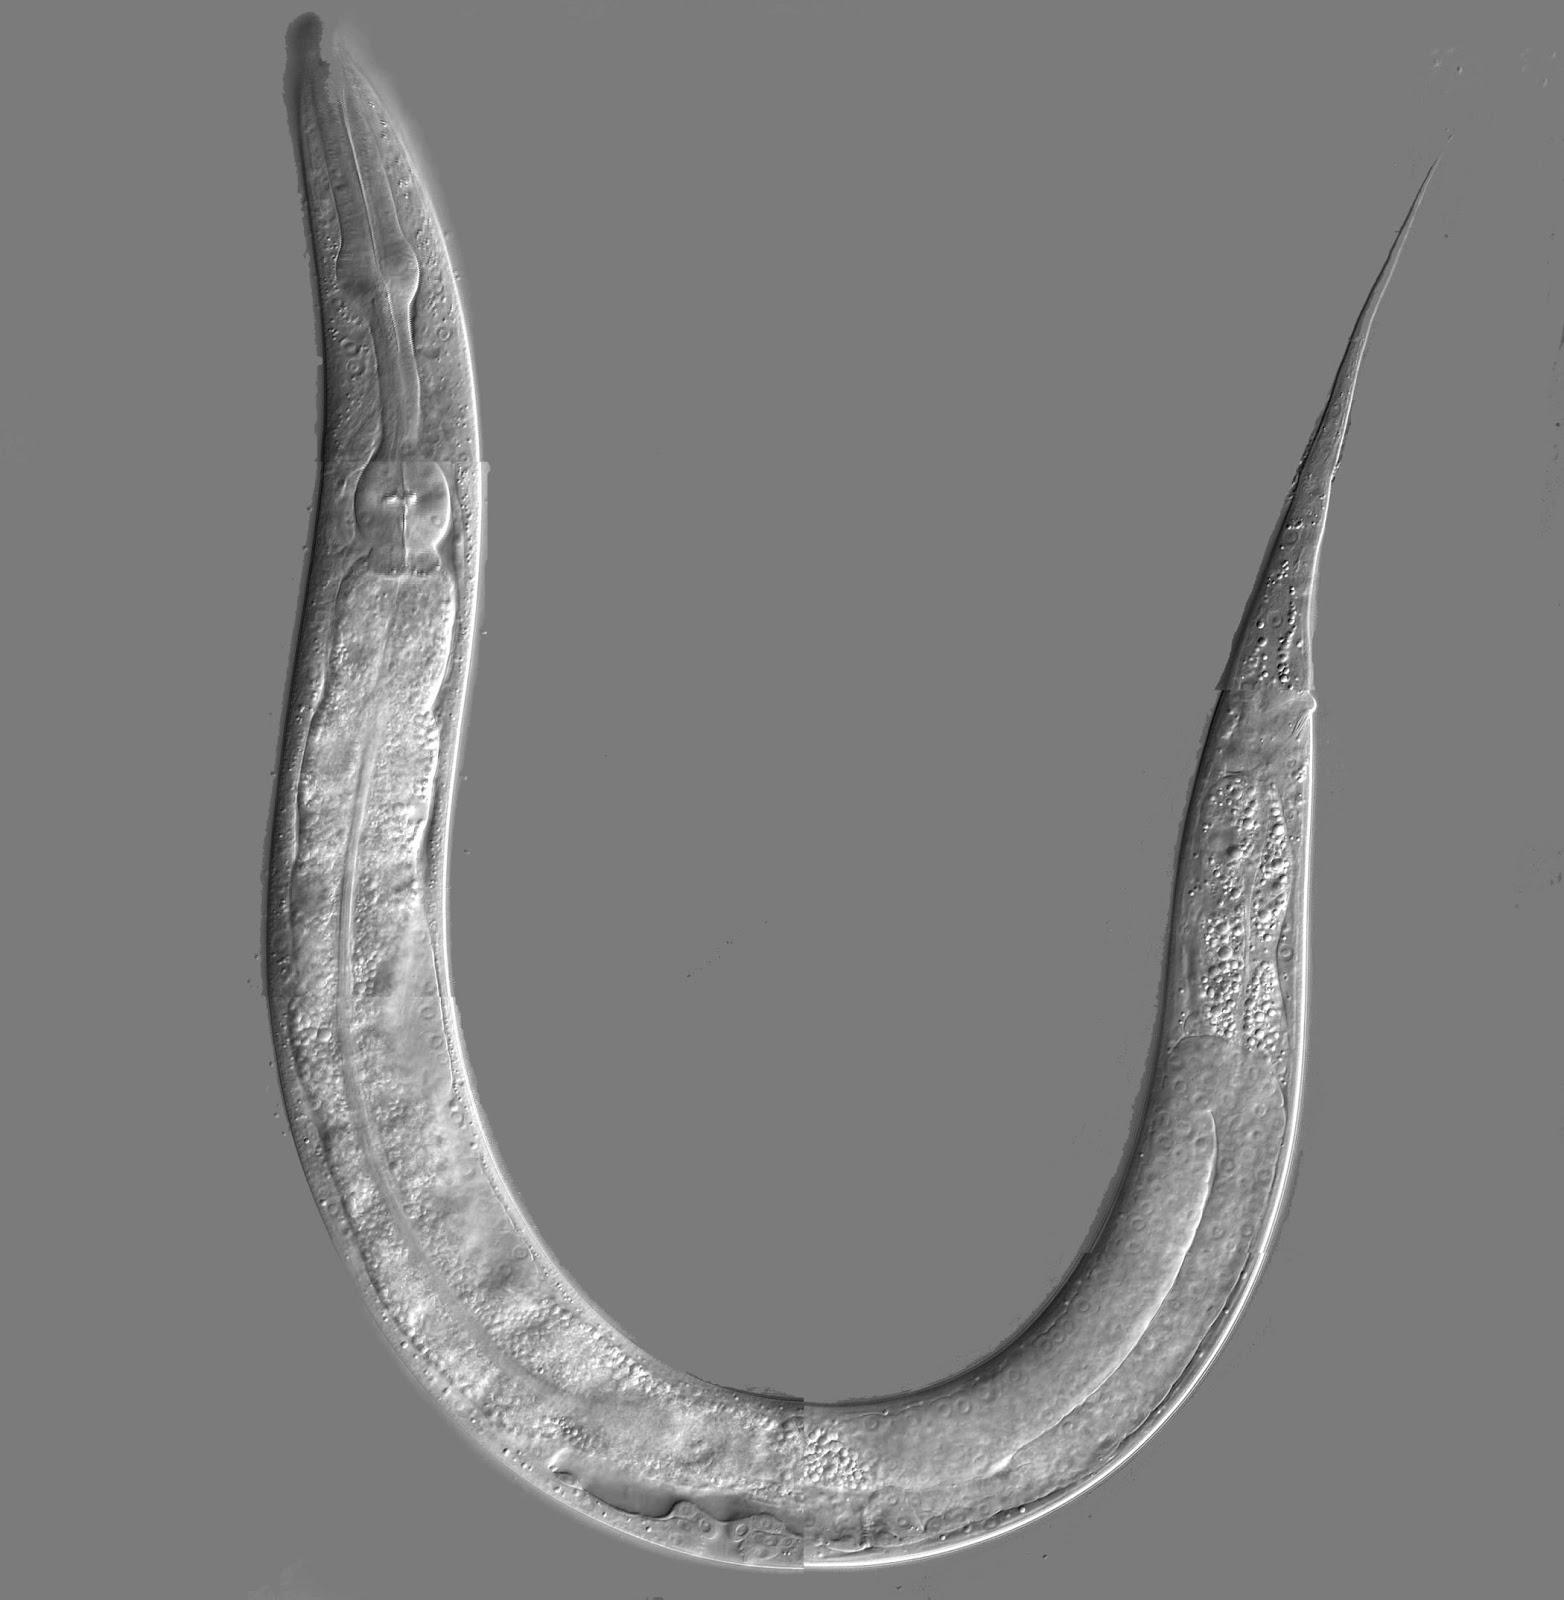 Tweaking One Enzyme Doubles A C Elegans Worms Lifespan